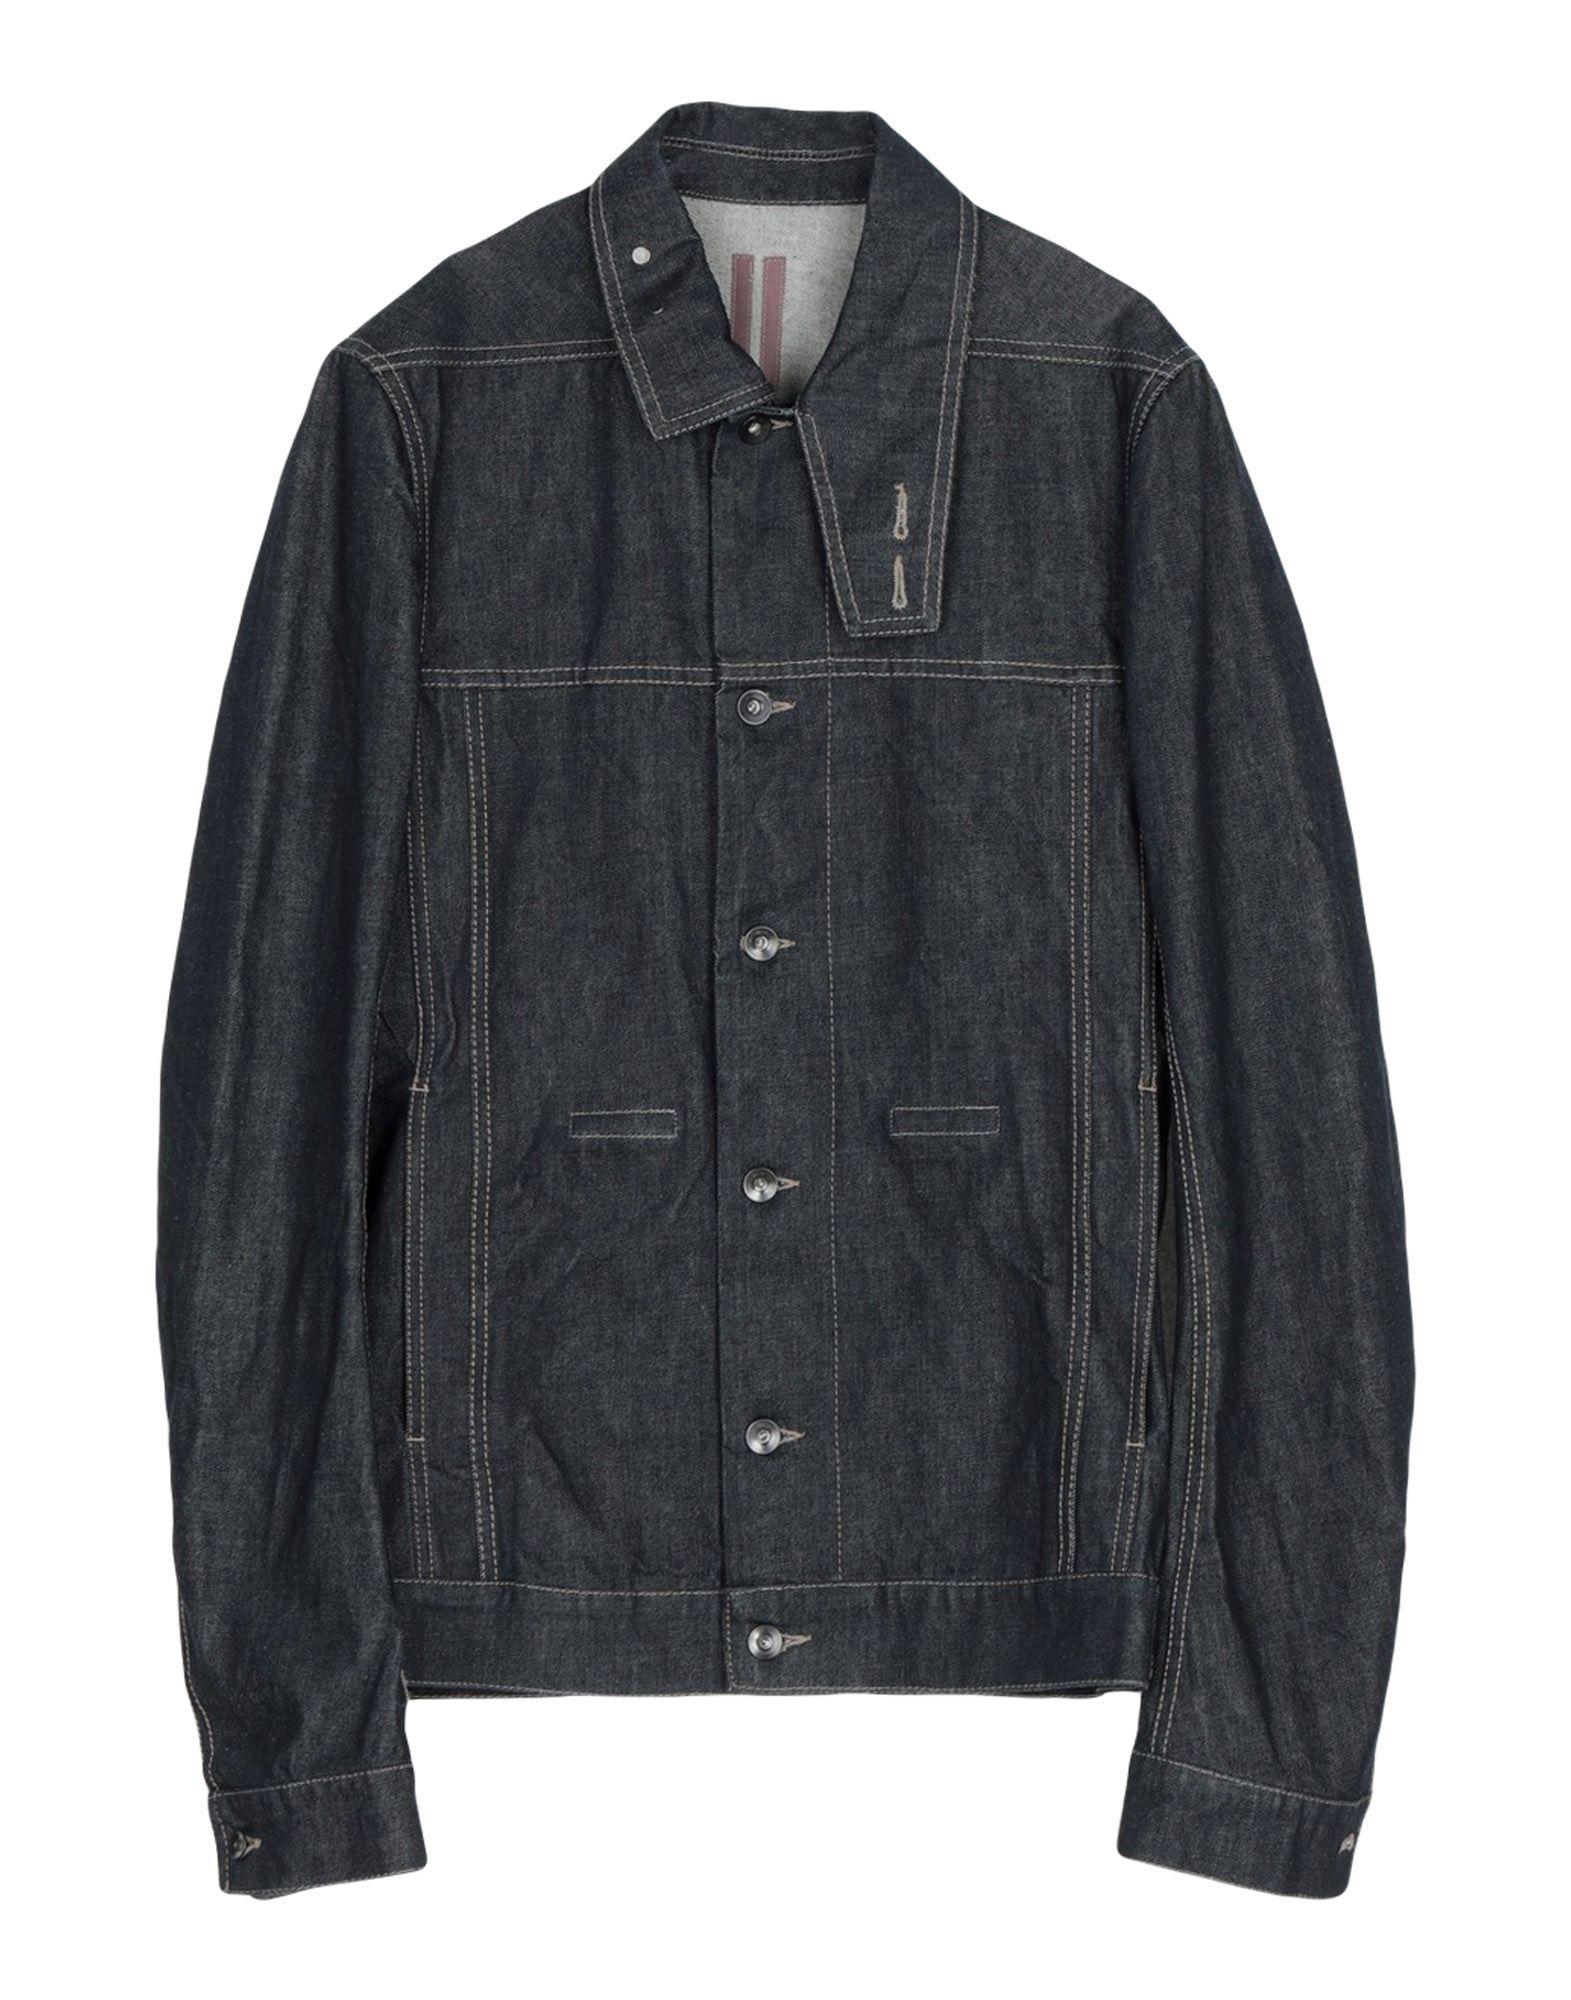 DRKSHDW by RICK OWENS Джинсовая верхняя одежда блузка quelle rick cardona by heine 4025